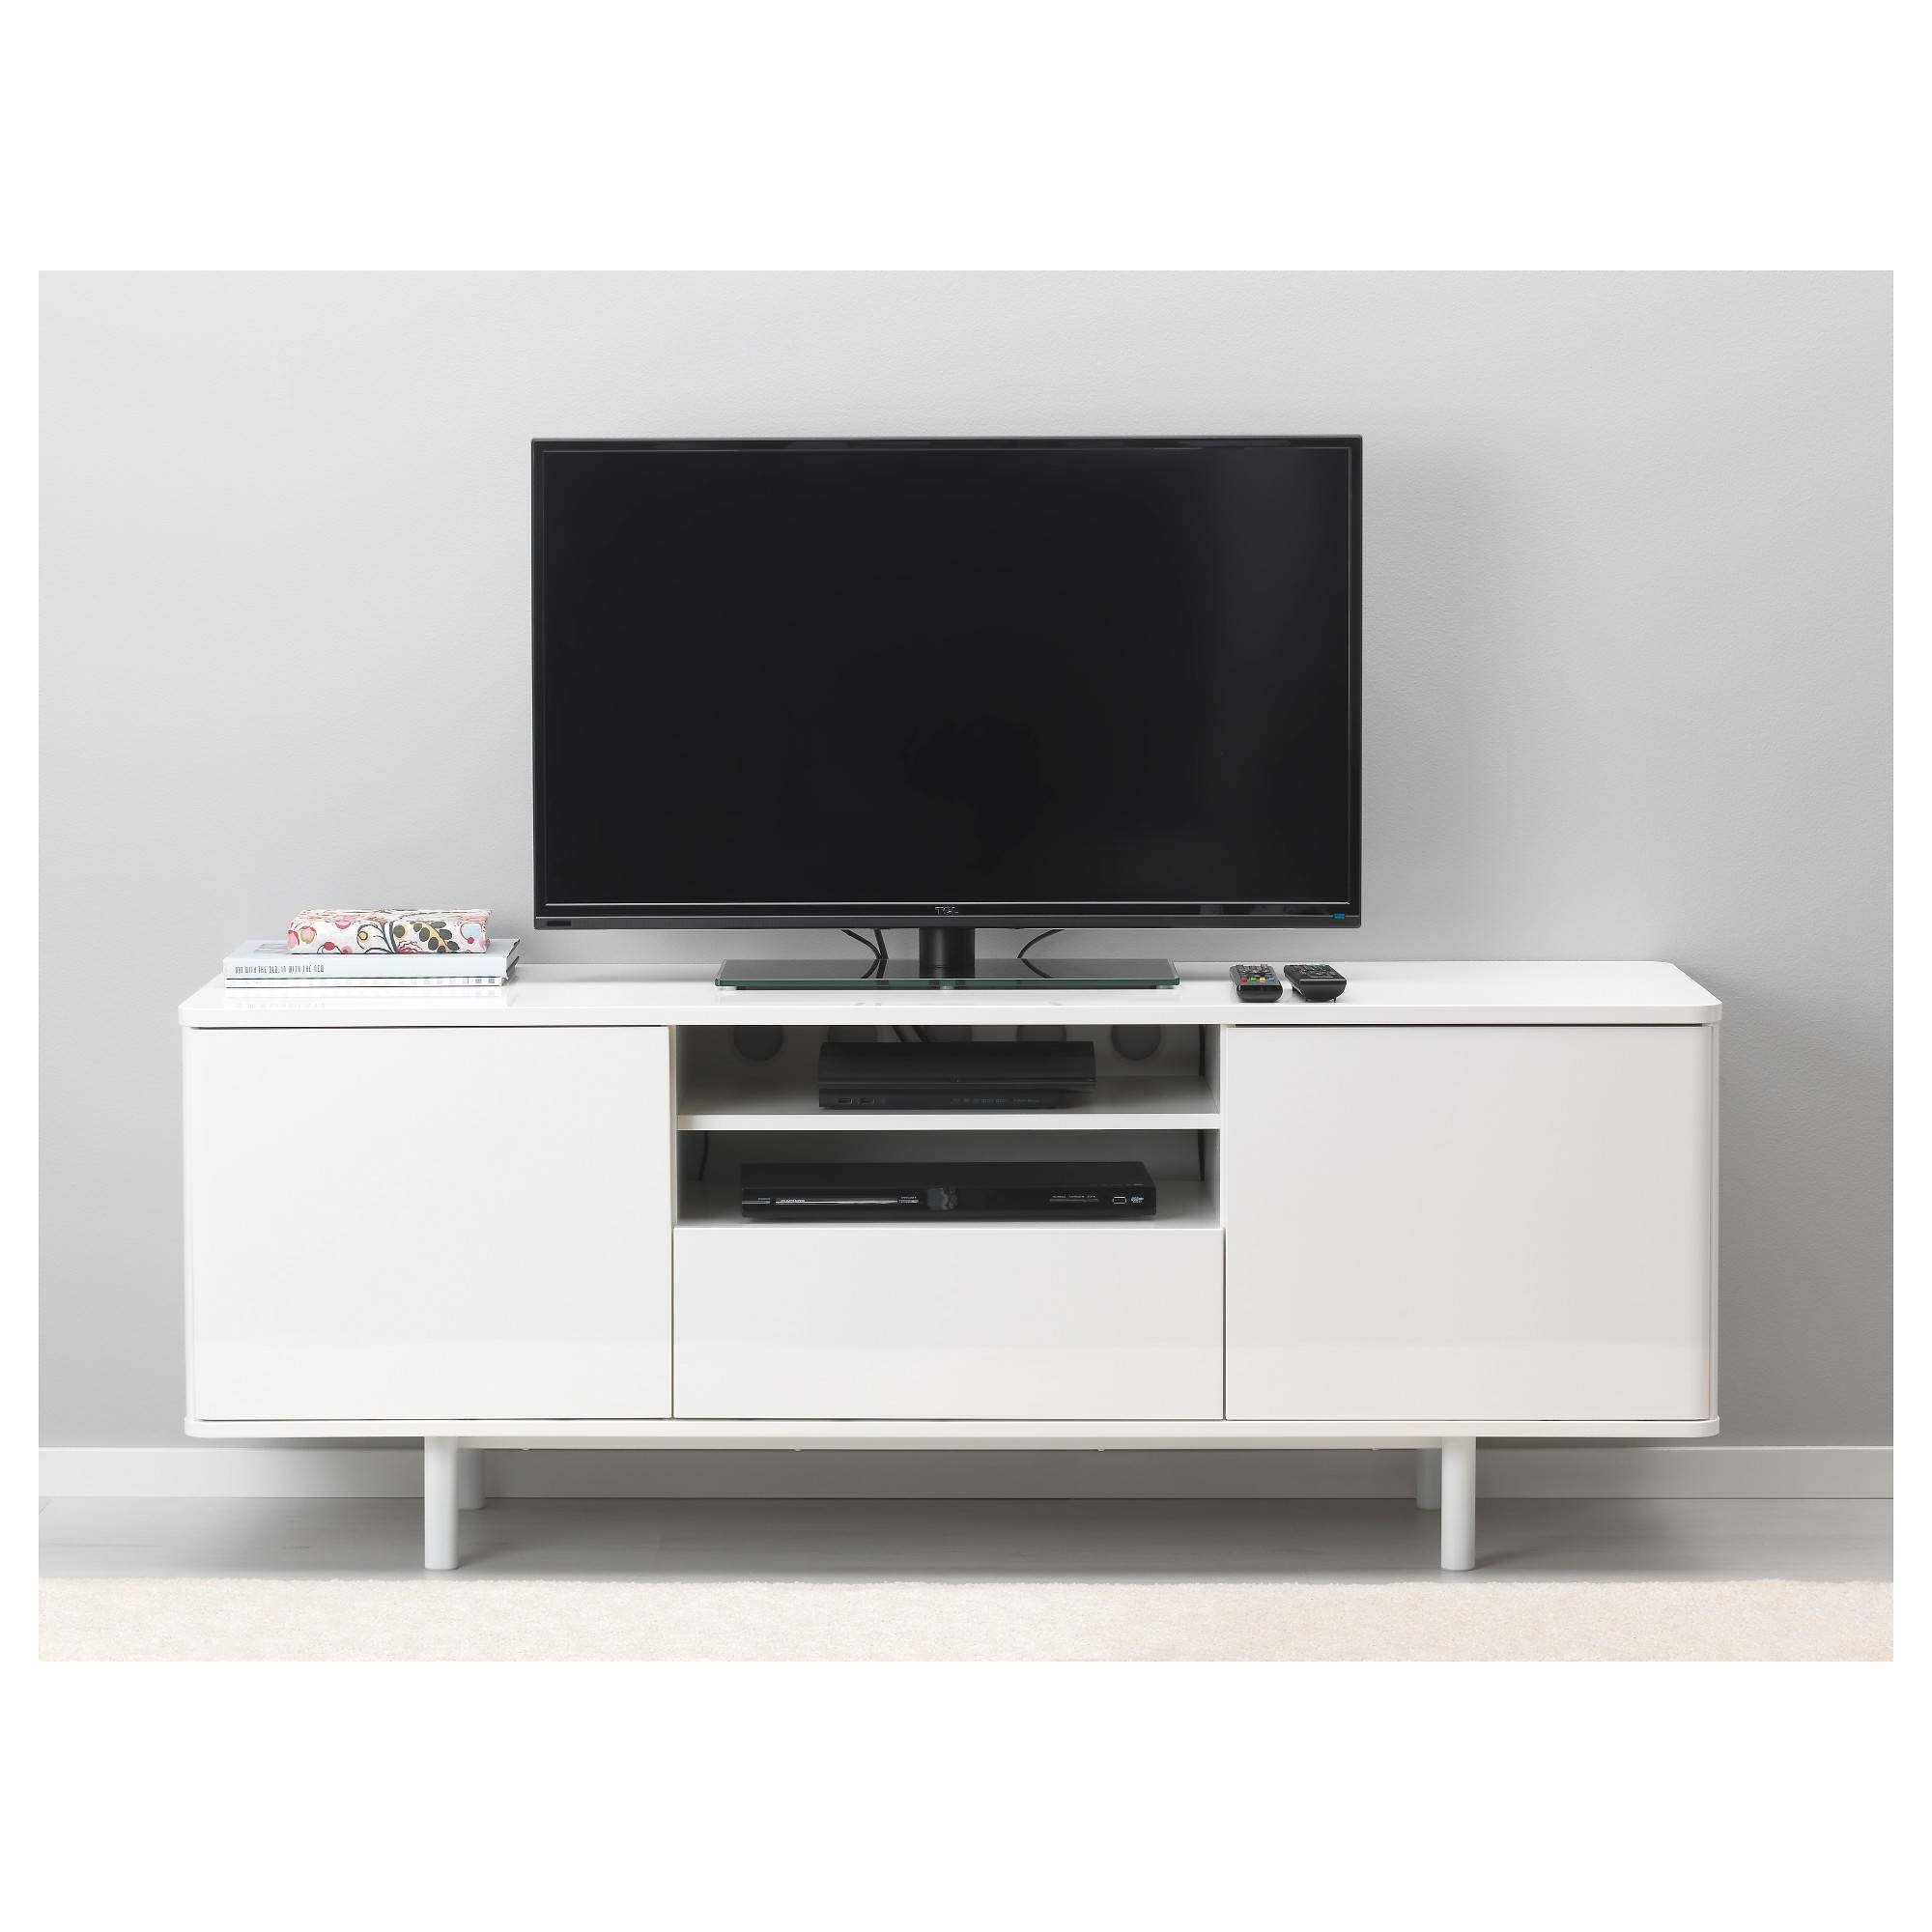 Mostorp Tv Bench White 159X46 Cm - Ikea inside Tv Drawer Units (Image 9 of 15)